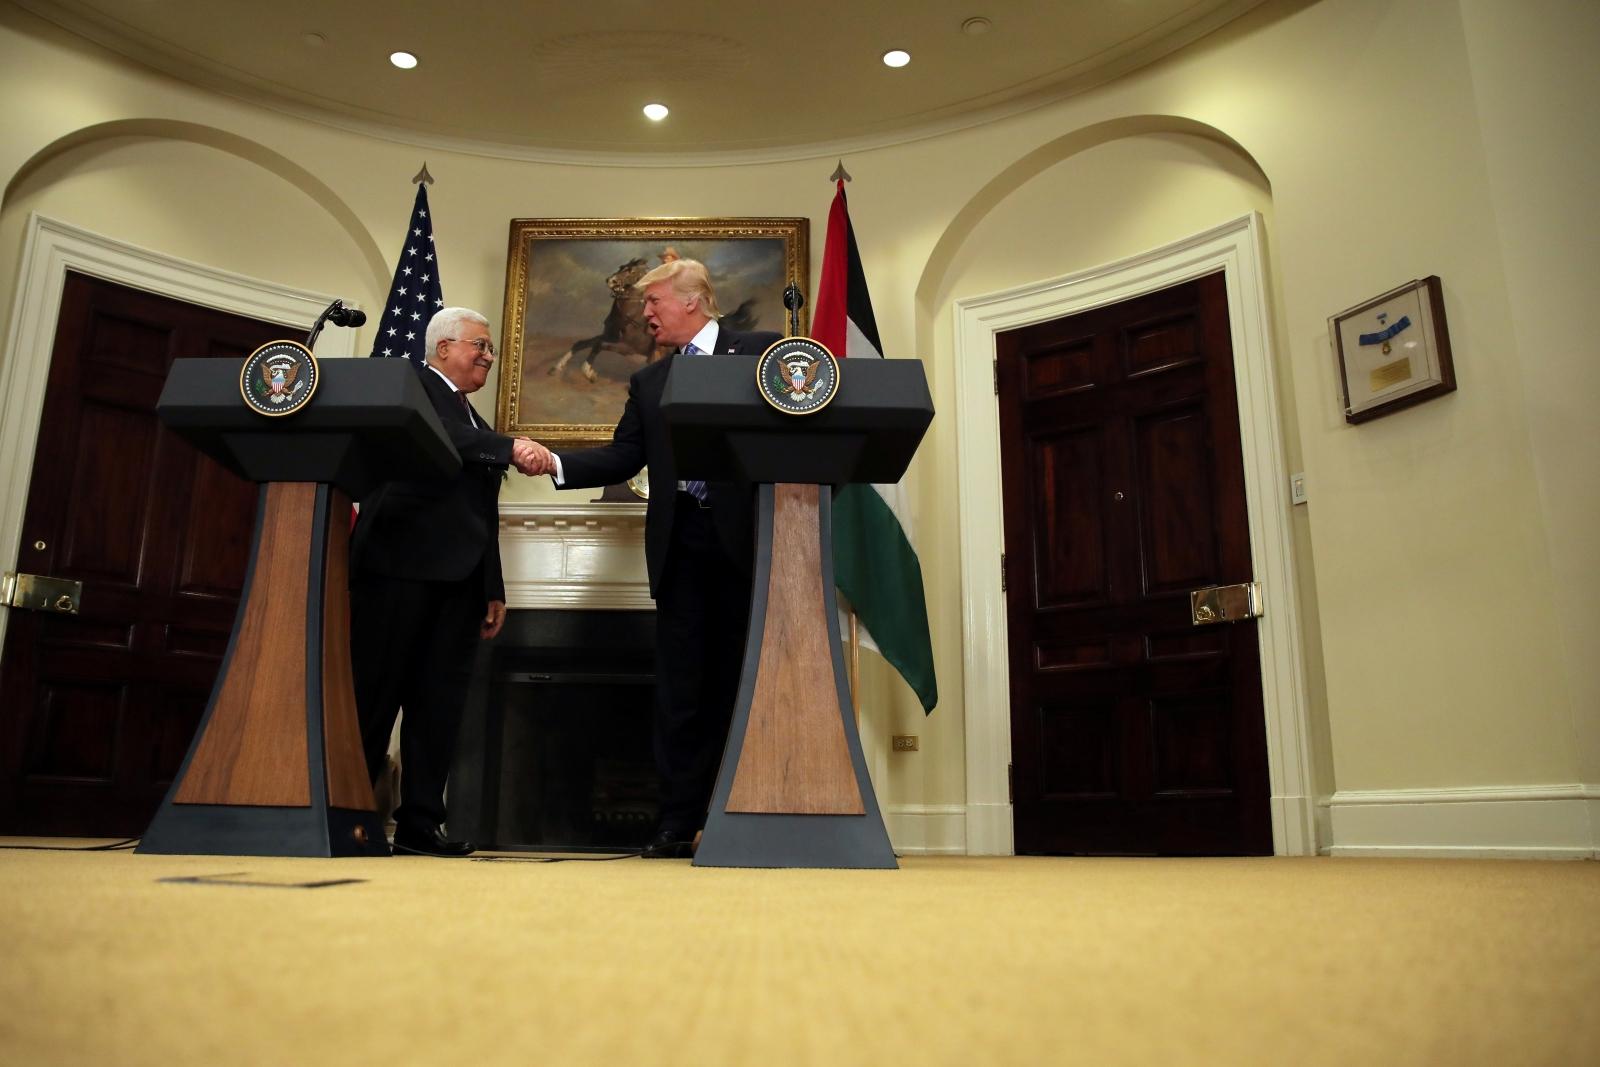 Donald Trump and Mohamoud Abbas shake hands